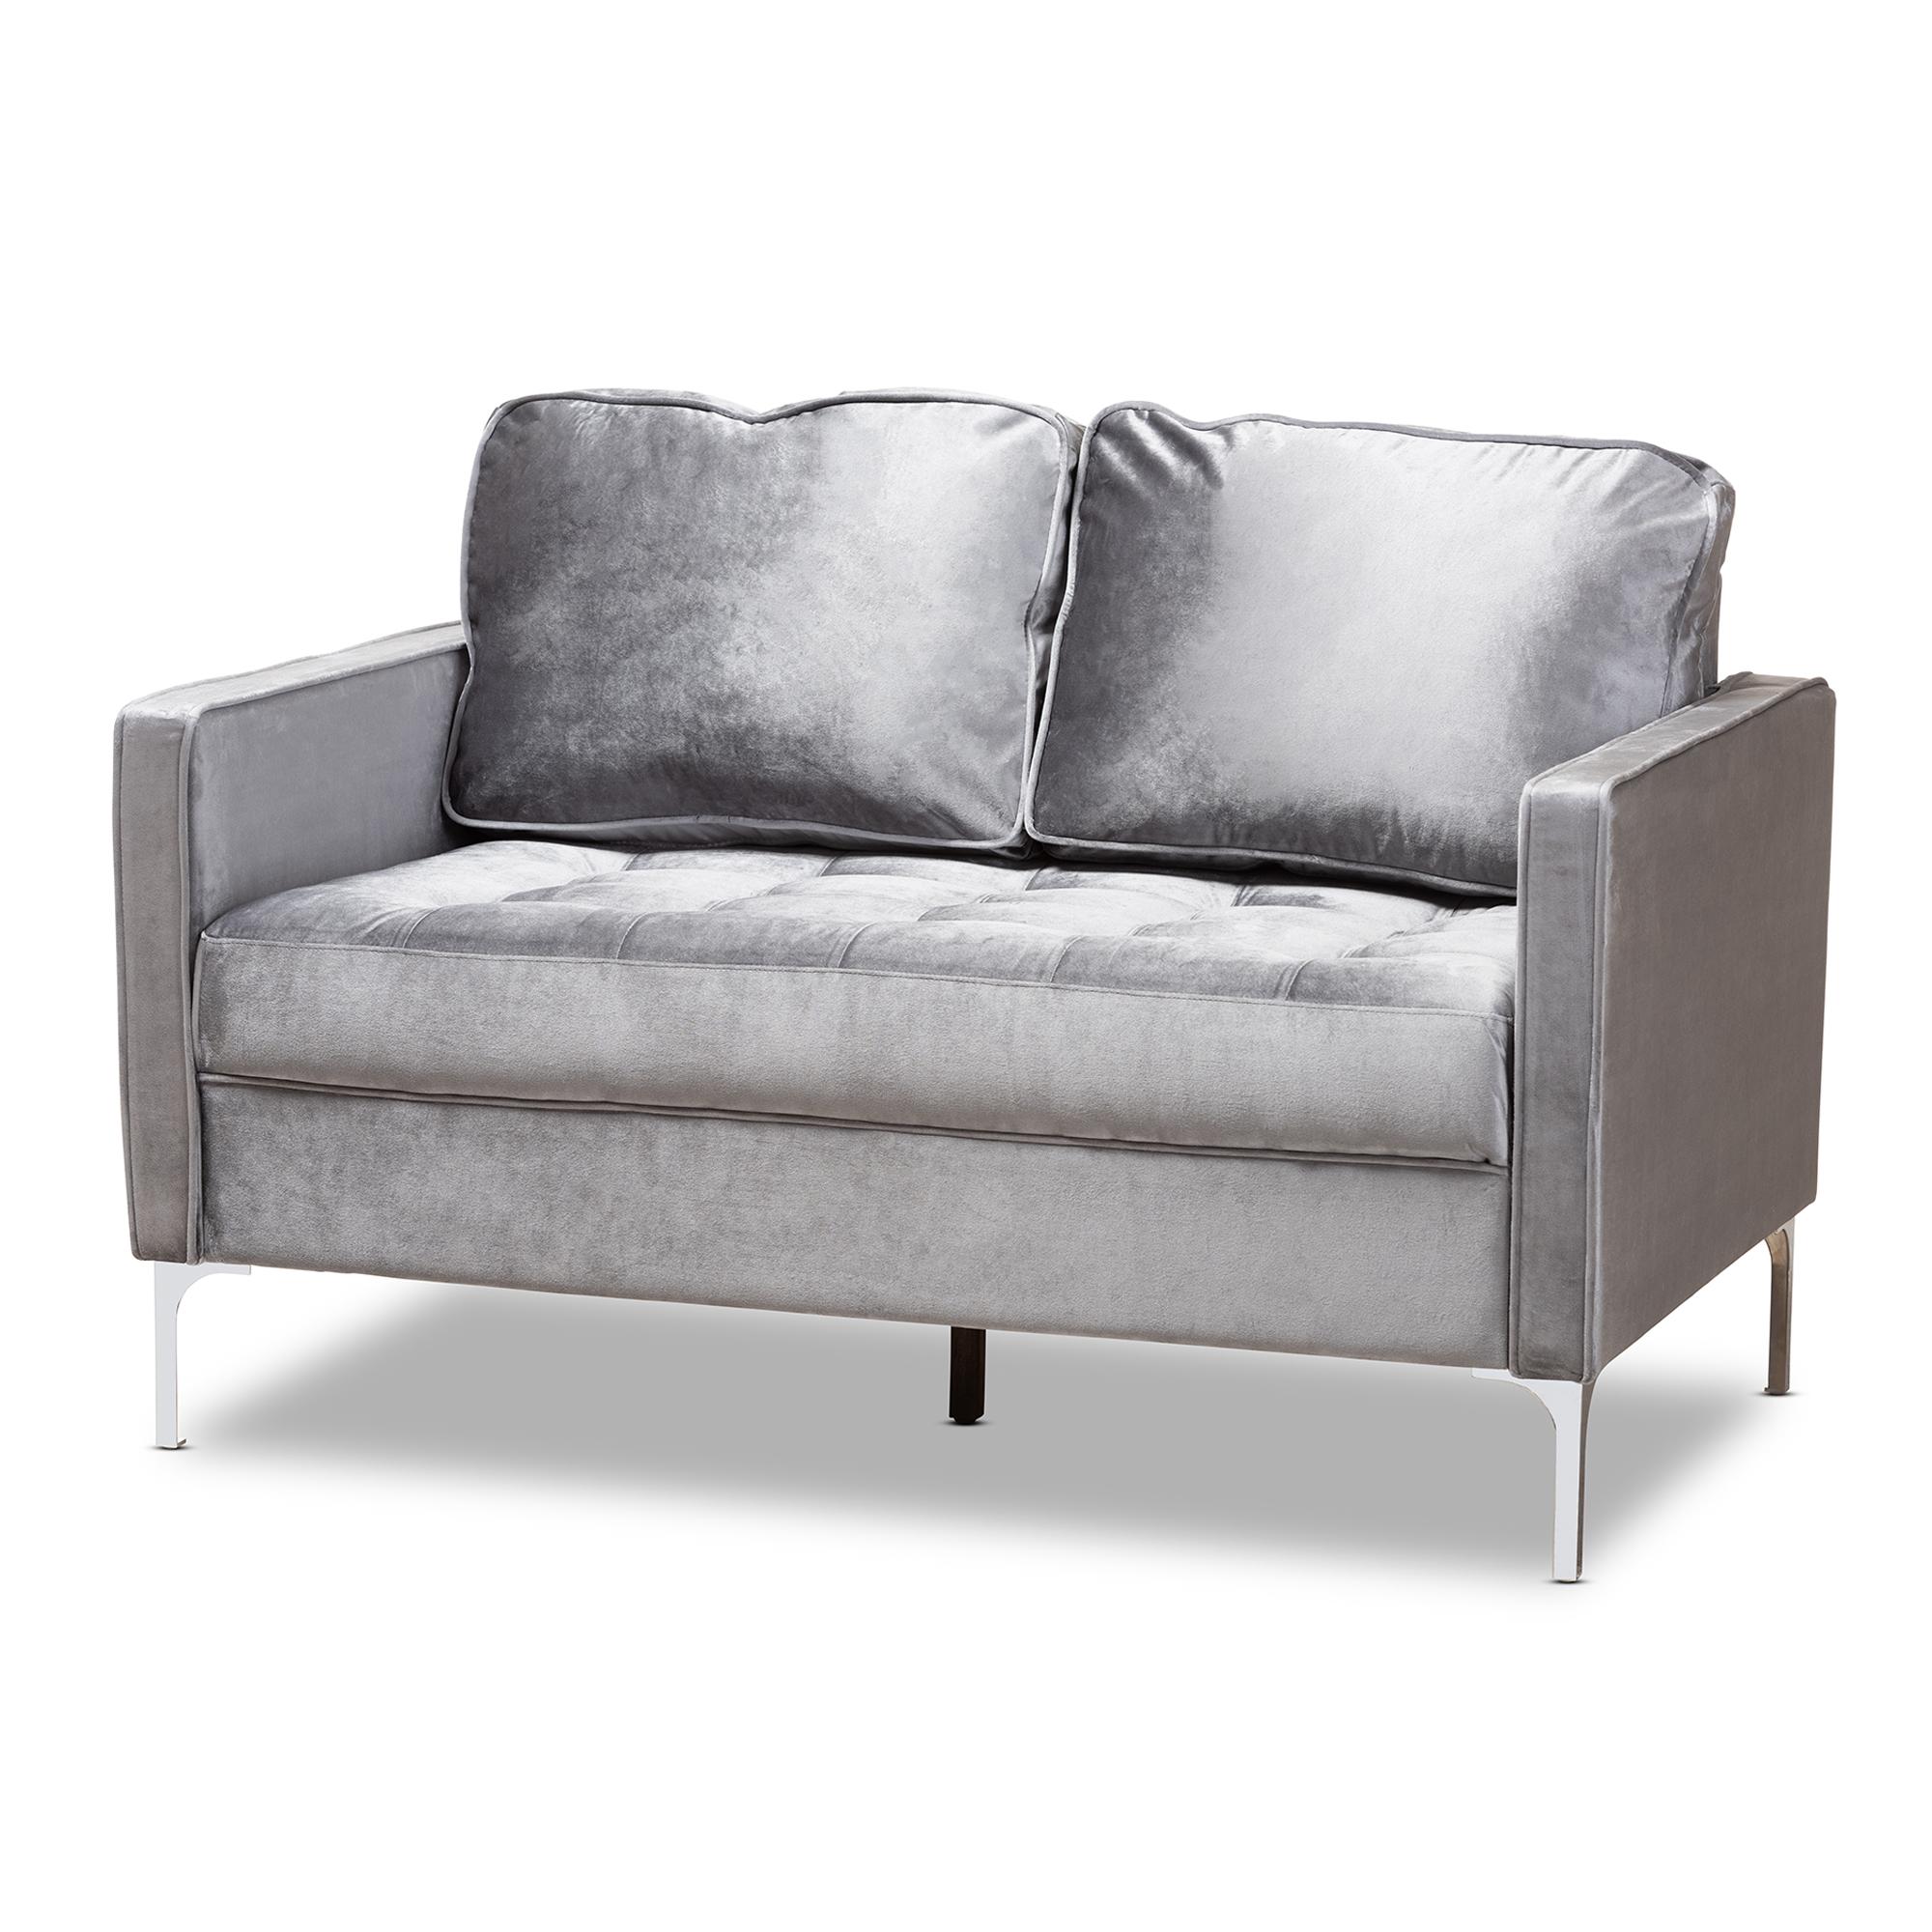 Baxton Studio Clara Modern And Contemporary Grey Velvet Fabric Upholstered 2 Seater Loveseat